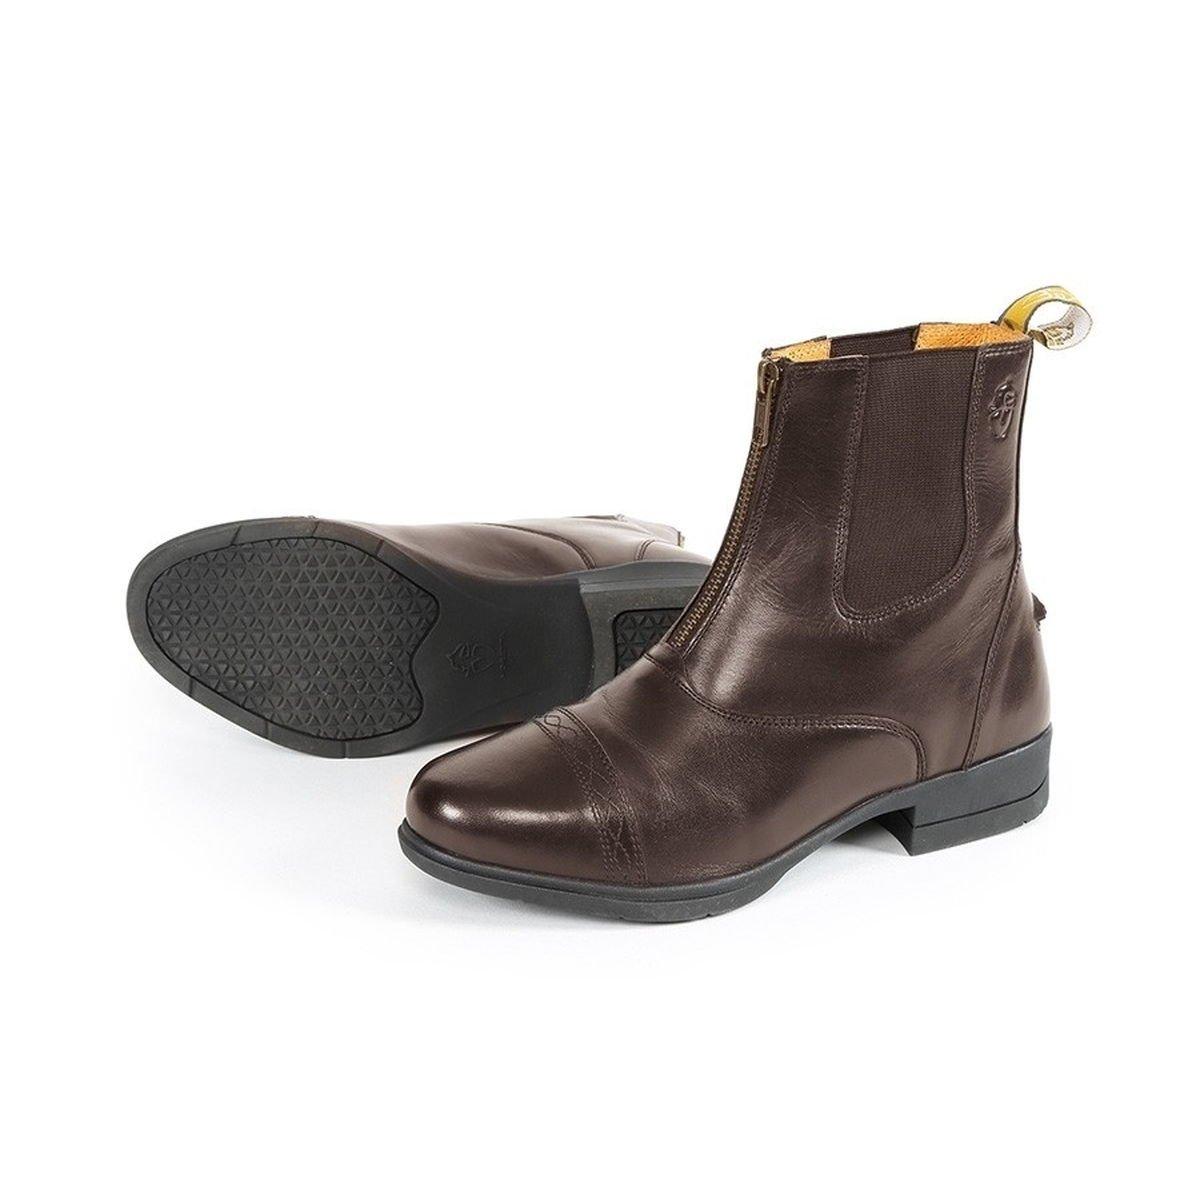 Shires Moretta Erwachsene Rosatta Zip Paddock Stiefel – Braun